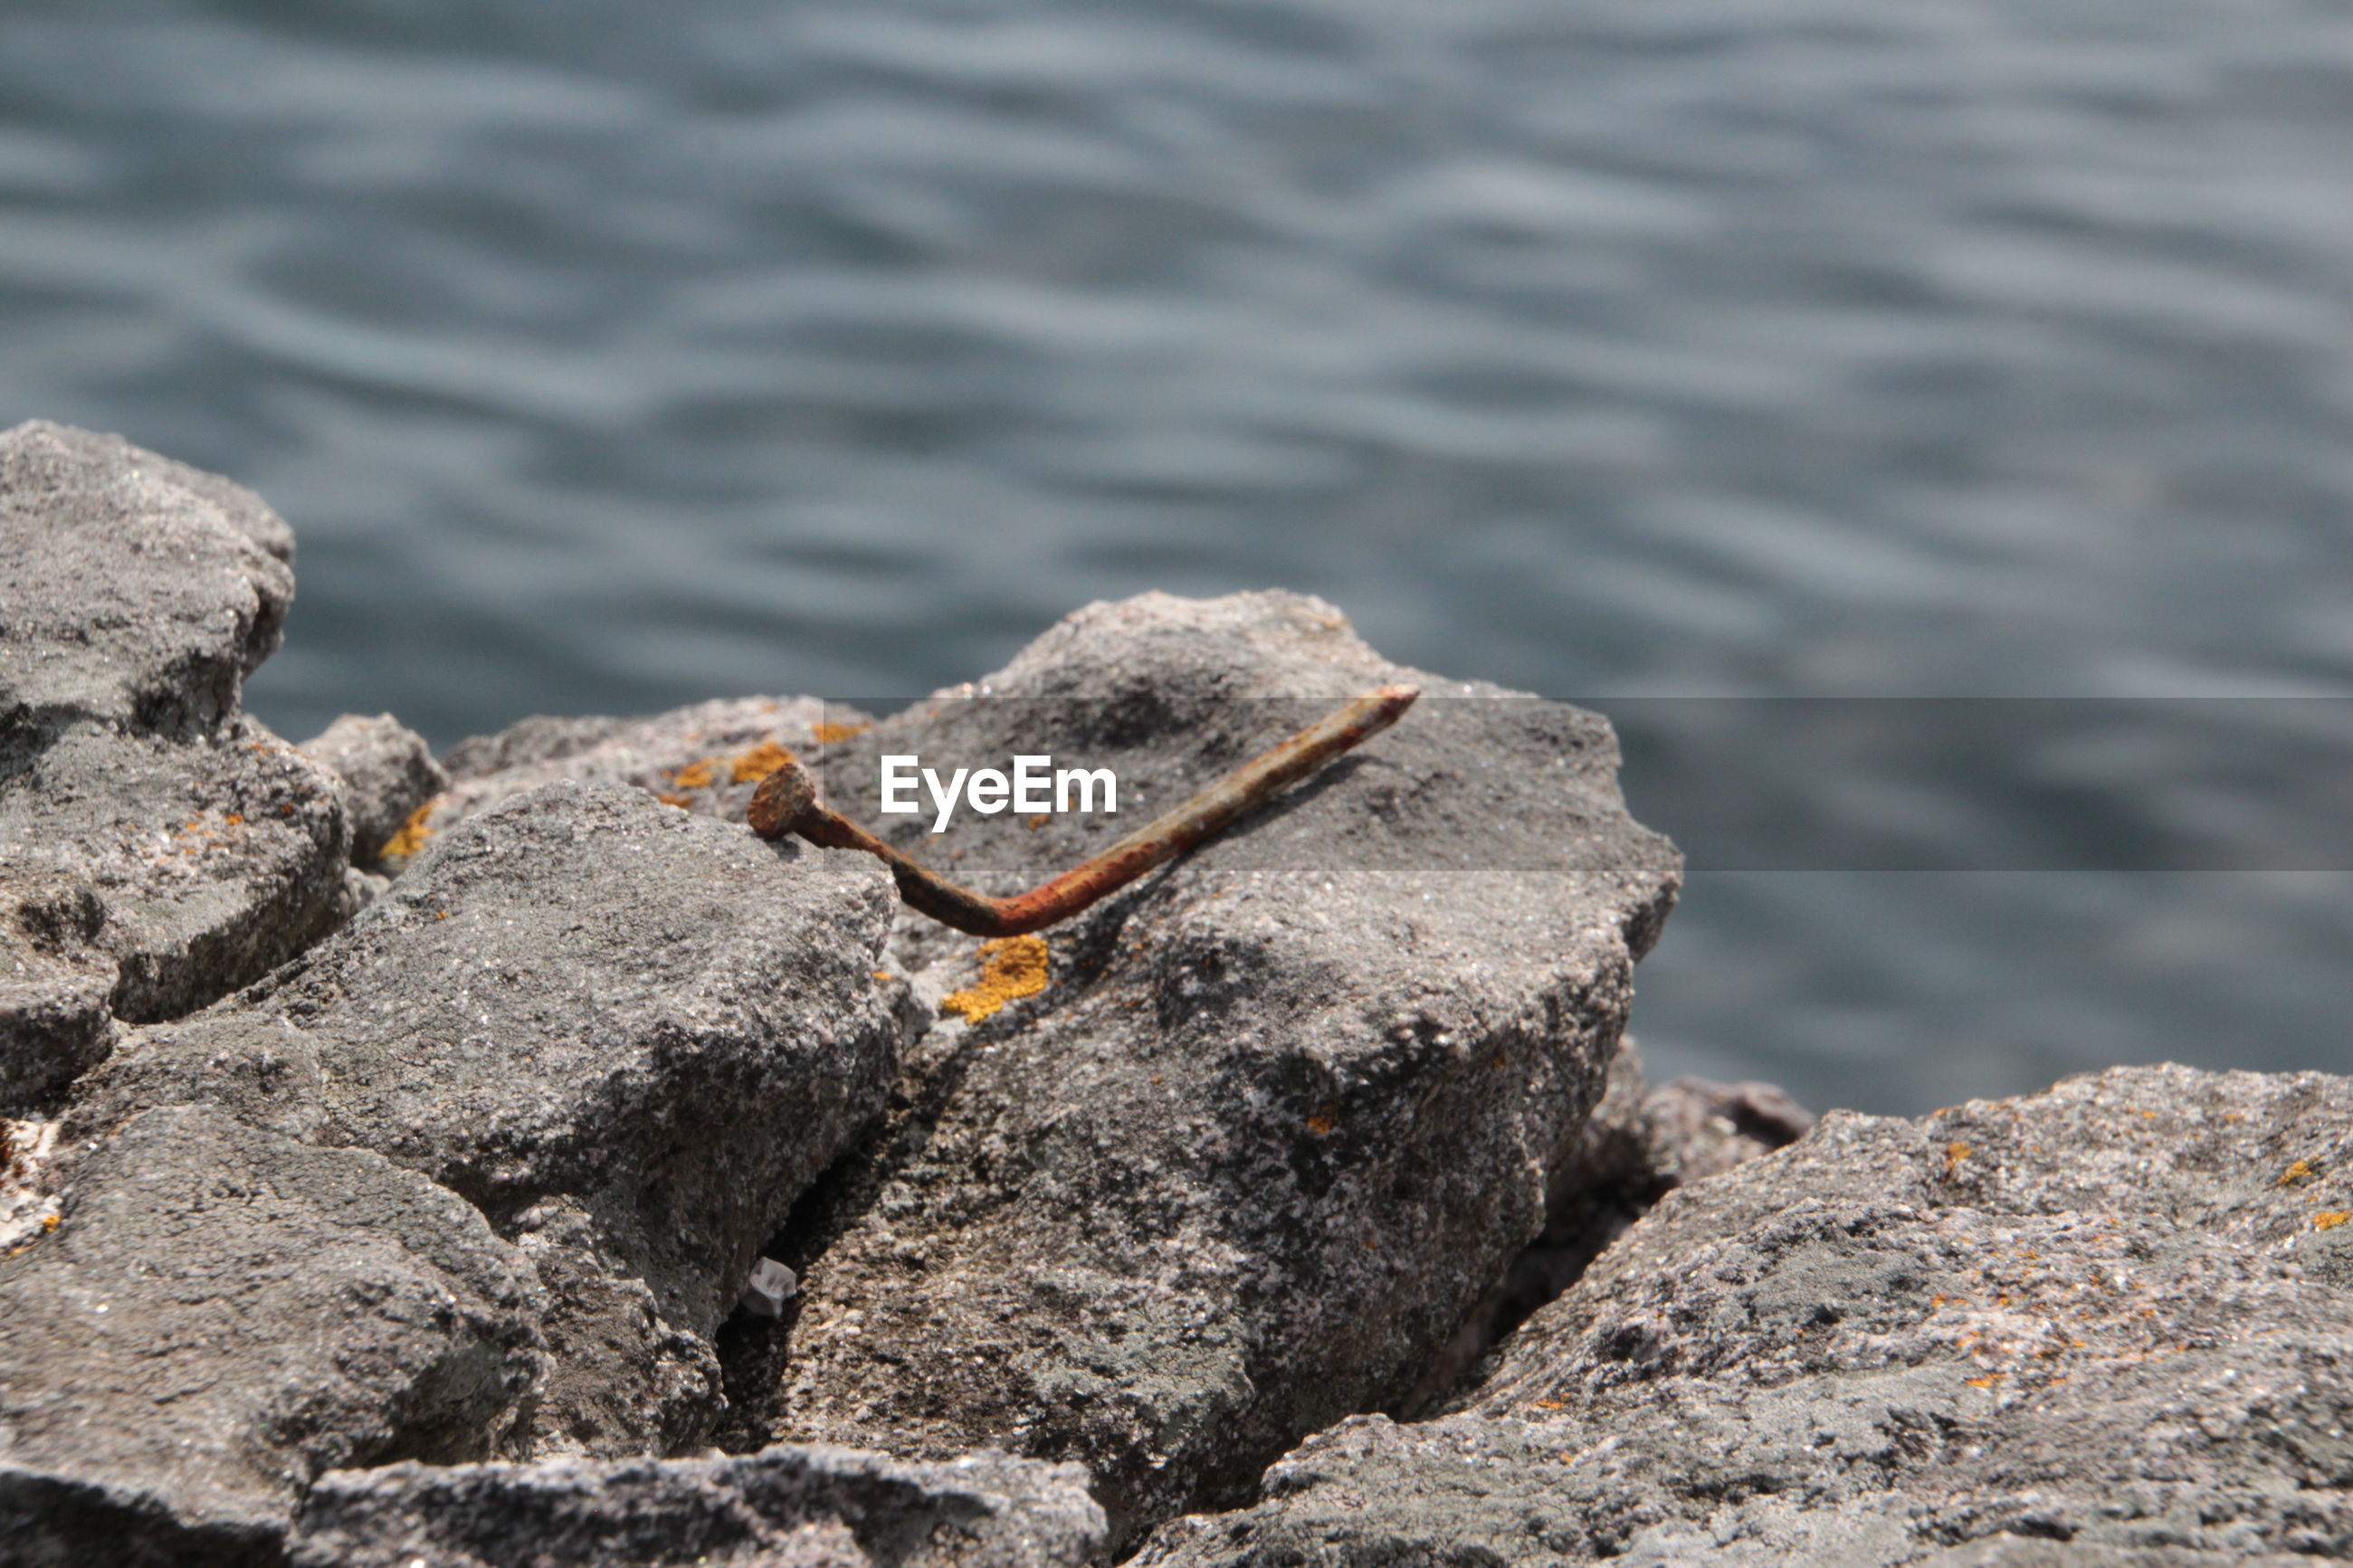 High angle view of rusty metallic nail on rock